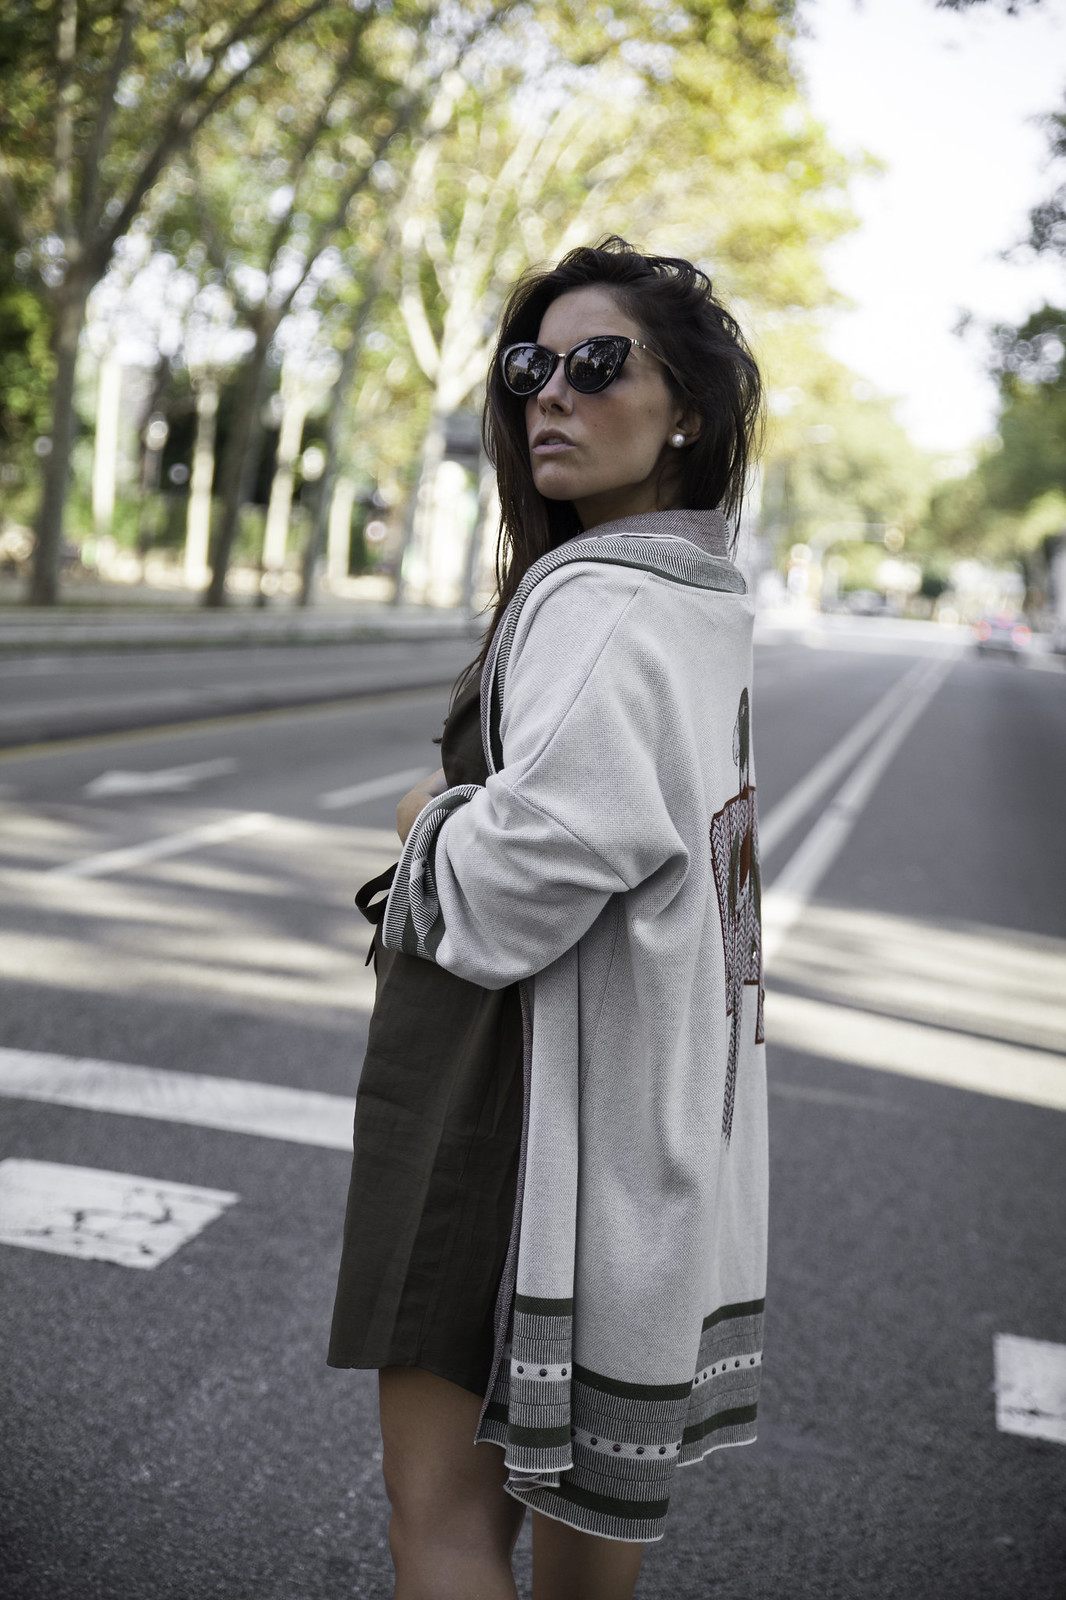 013_Como_combinar_un_cardigan_khaki_etnico_otoño_theguestgirl_rüga_laura_santolaira_influencer_embarazada_fashion_street_style_barcelona